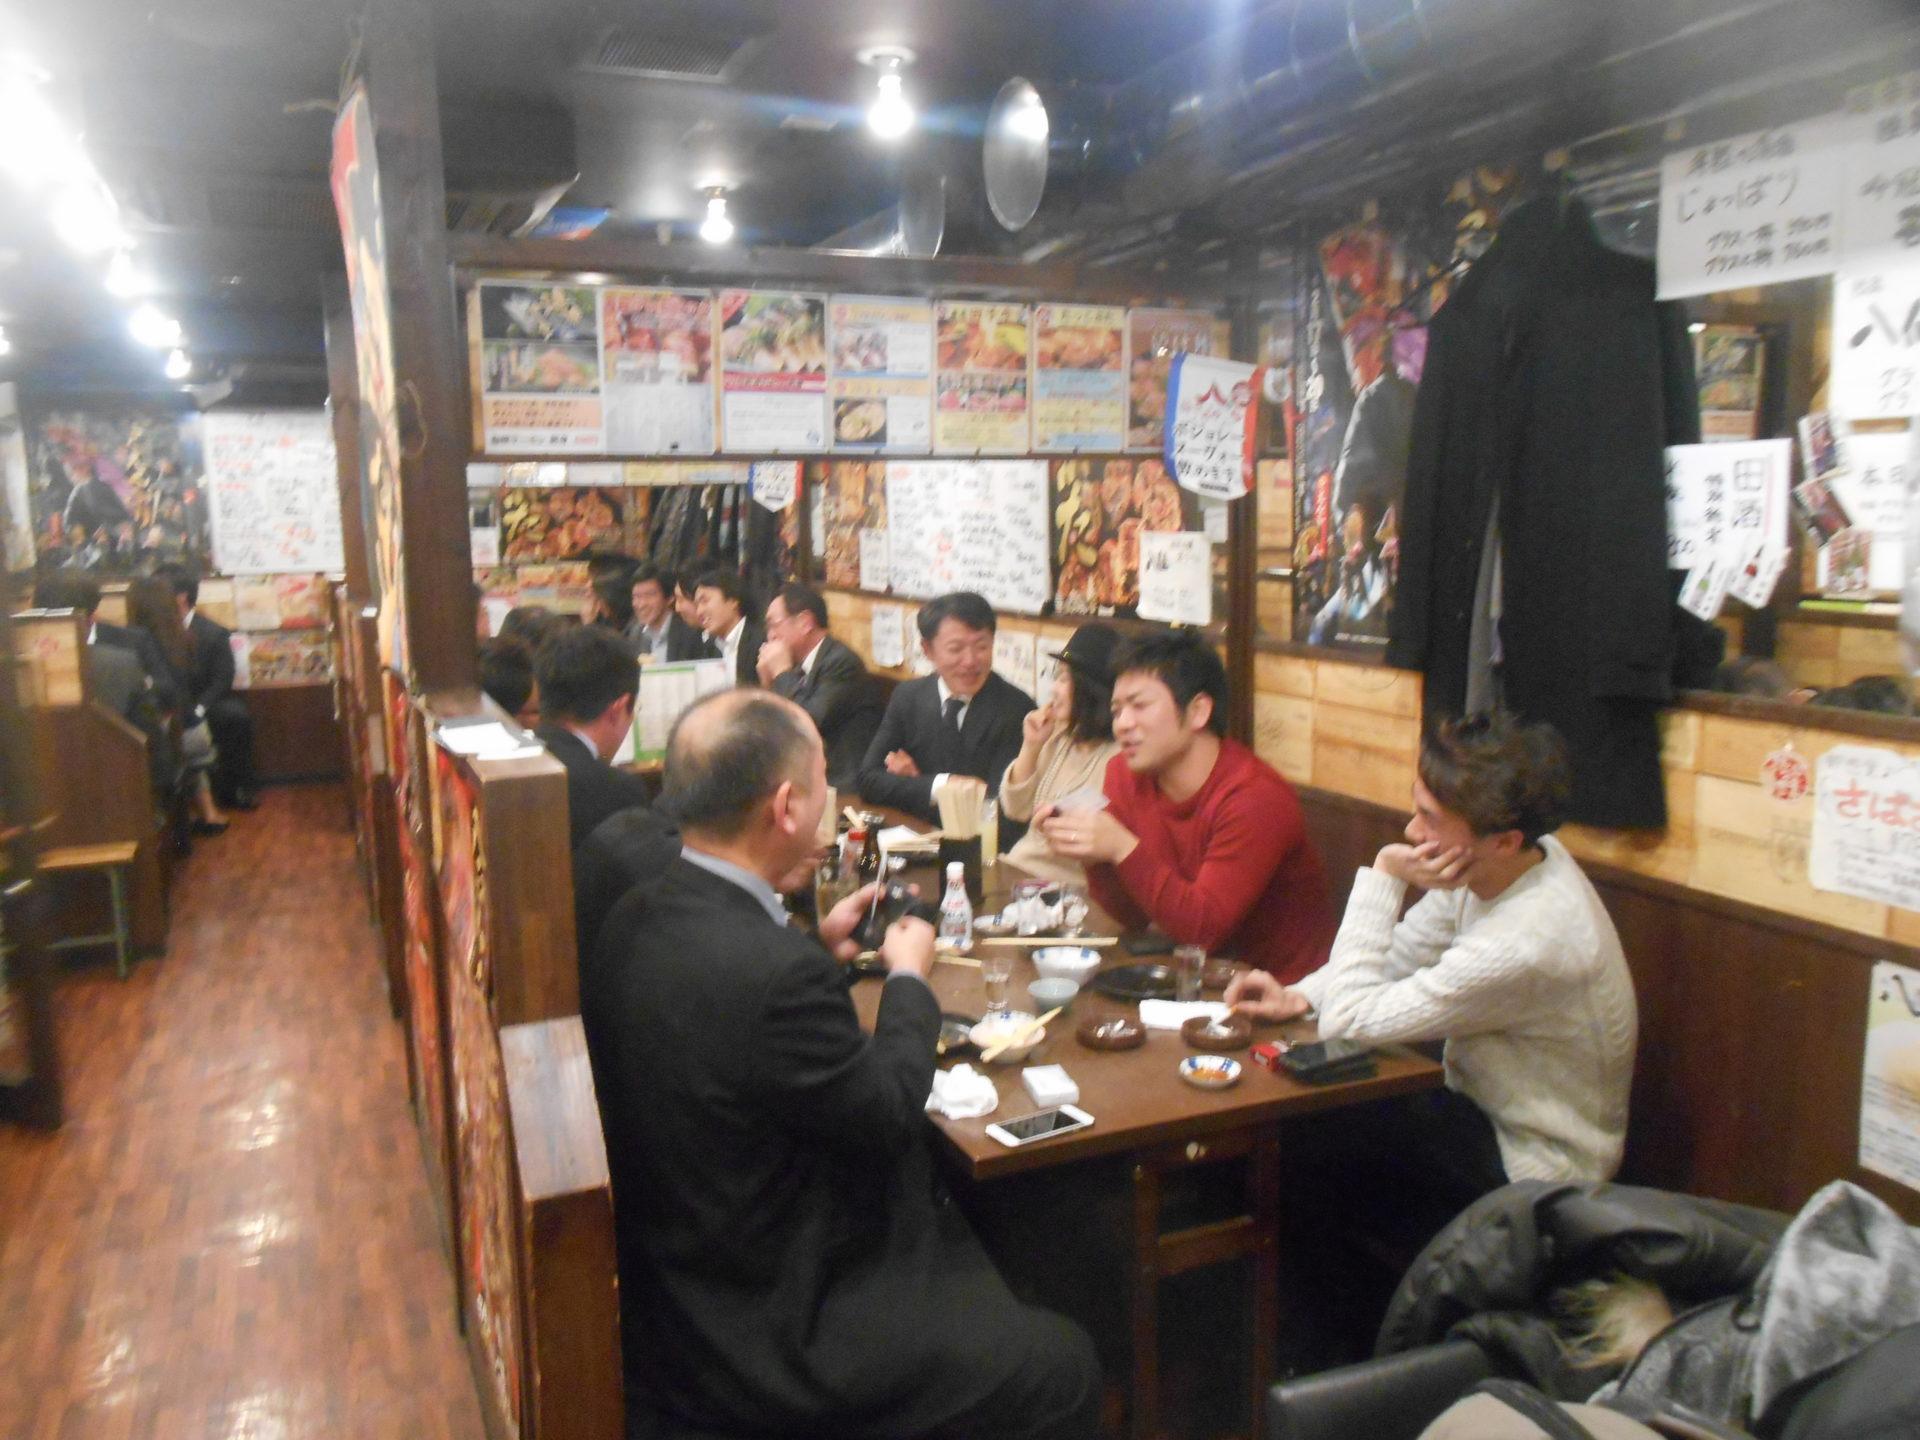 DSCN0610 1920x1440 - 2015年12月21日(月) AOsuki忘年会開催しました。